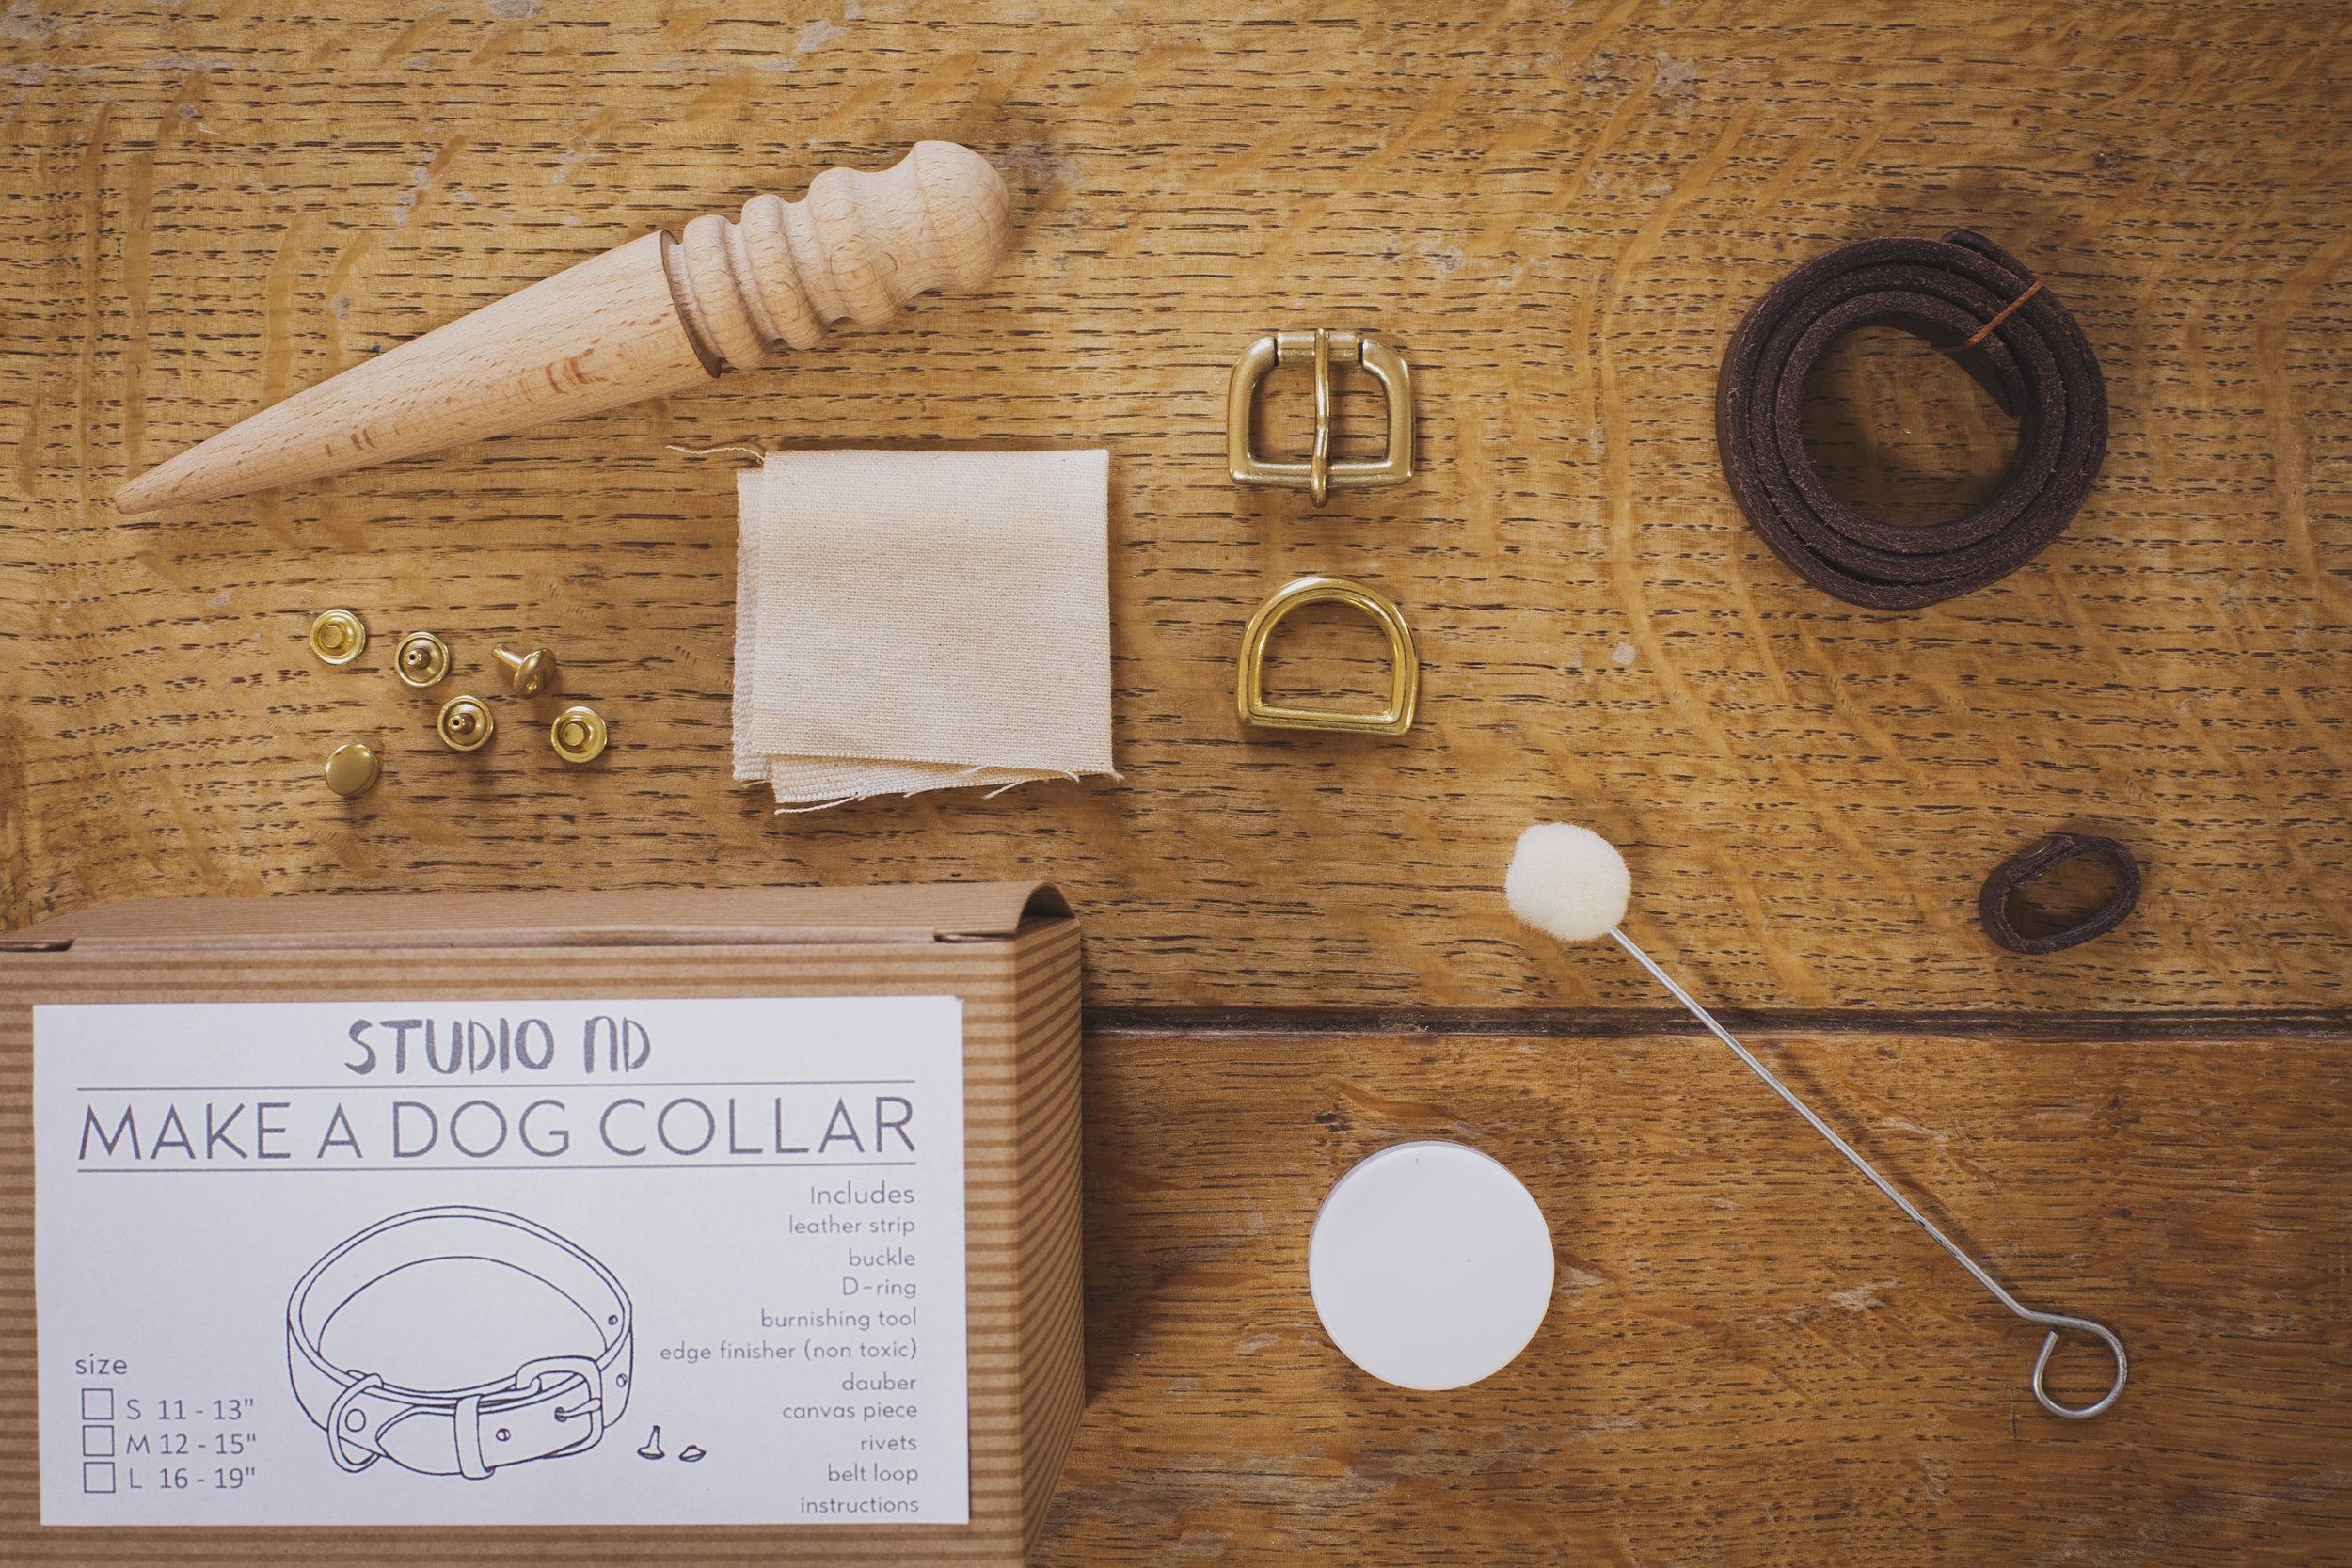 Make a Dog Collar Kit Instructions -